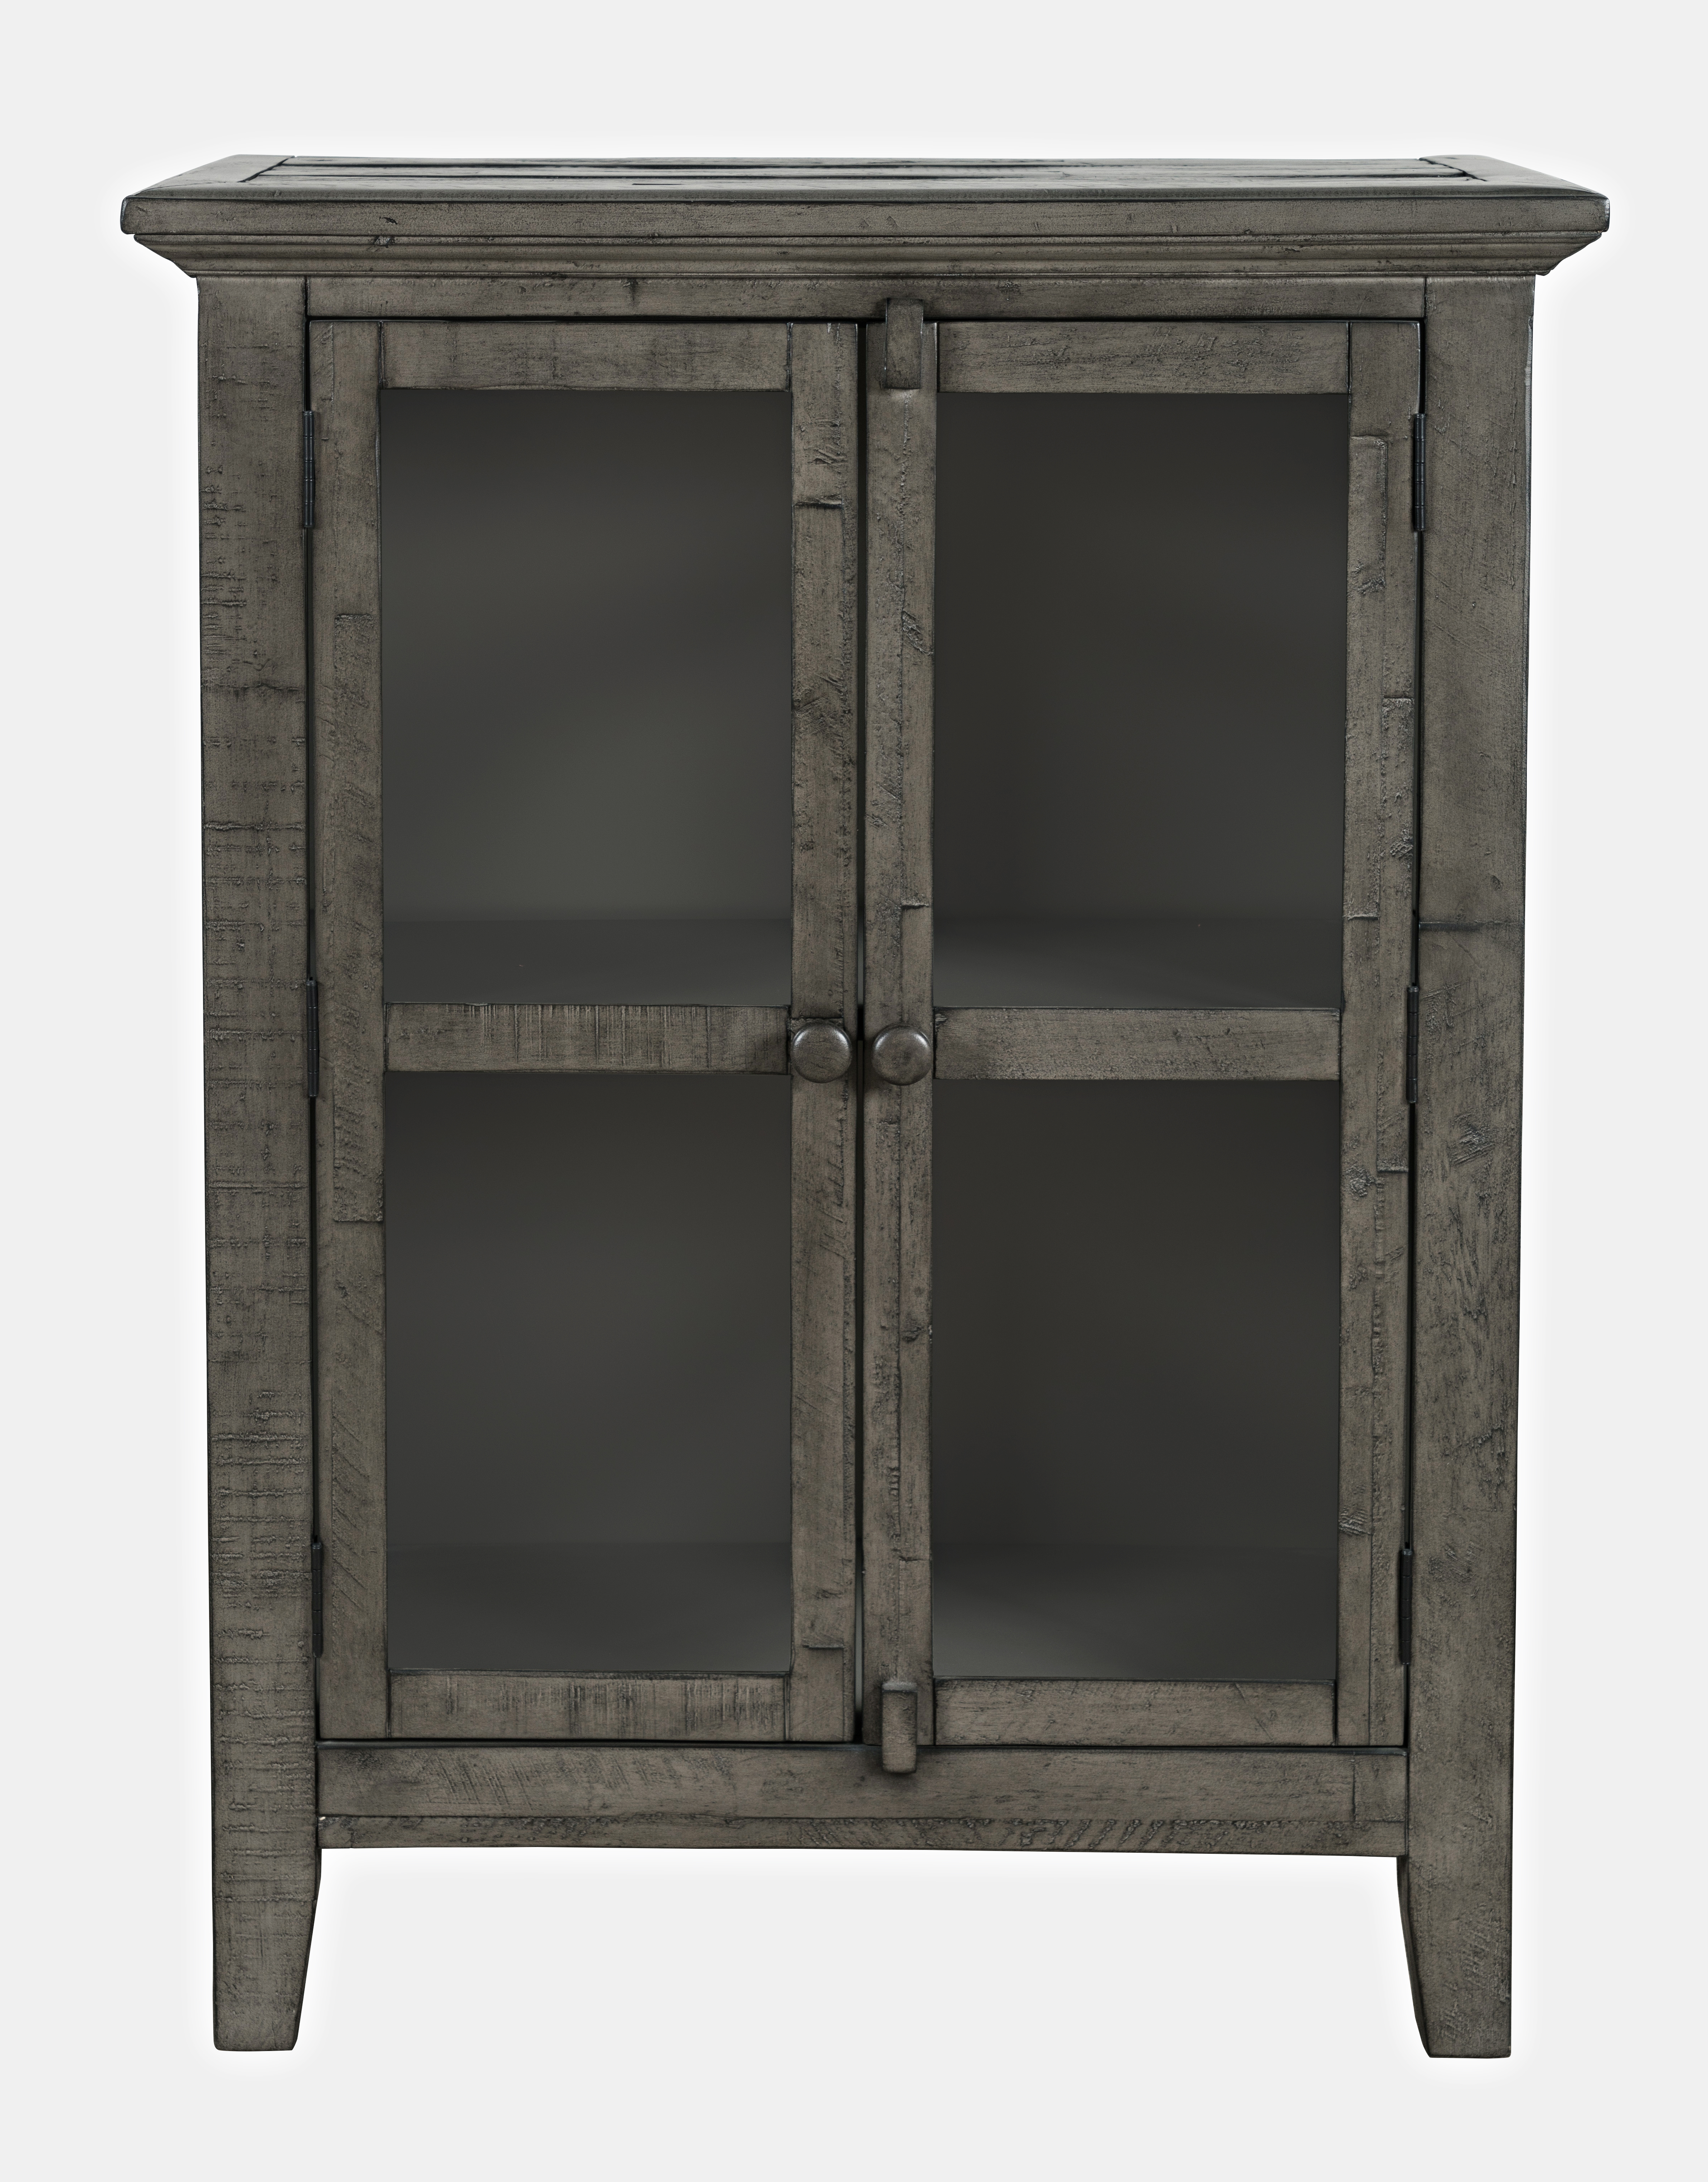 Rustic Shores 2 Door High Cabinet by VFM Signature at Virginia Furniture Market